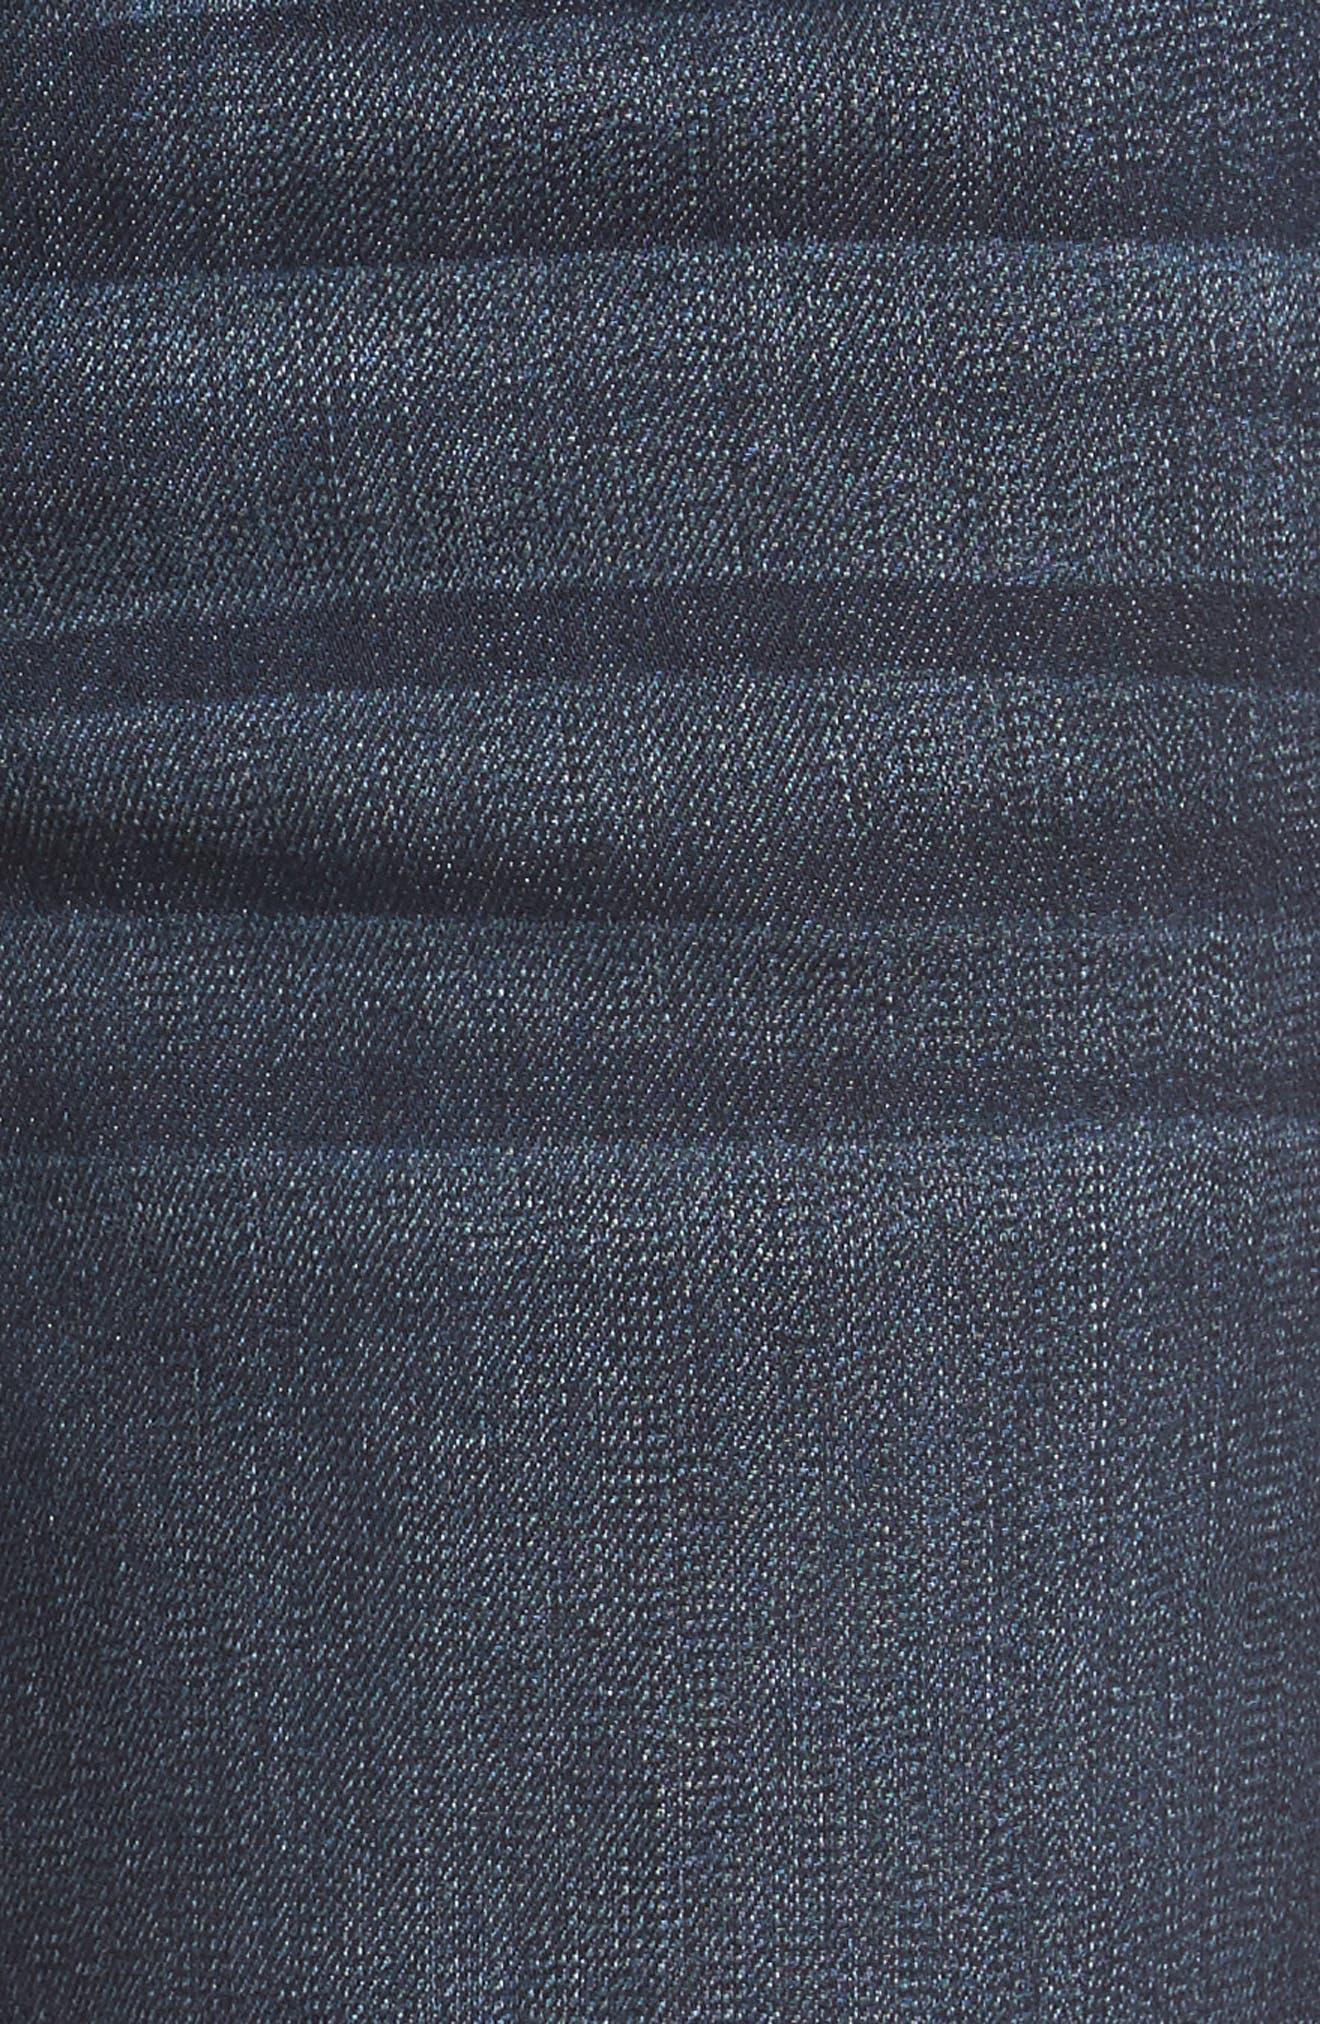 Ab-solution Cuffed Denim Shorts,                             Alternate thumbnail 5, color,                             Indigo